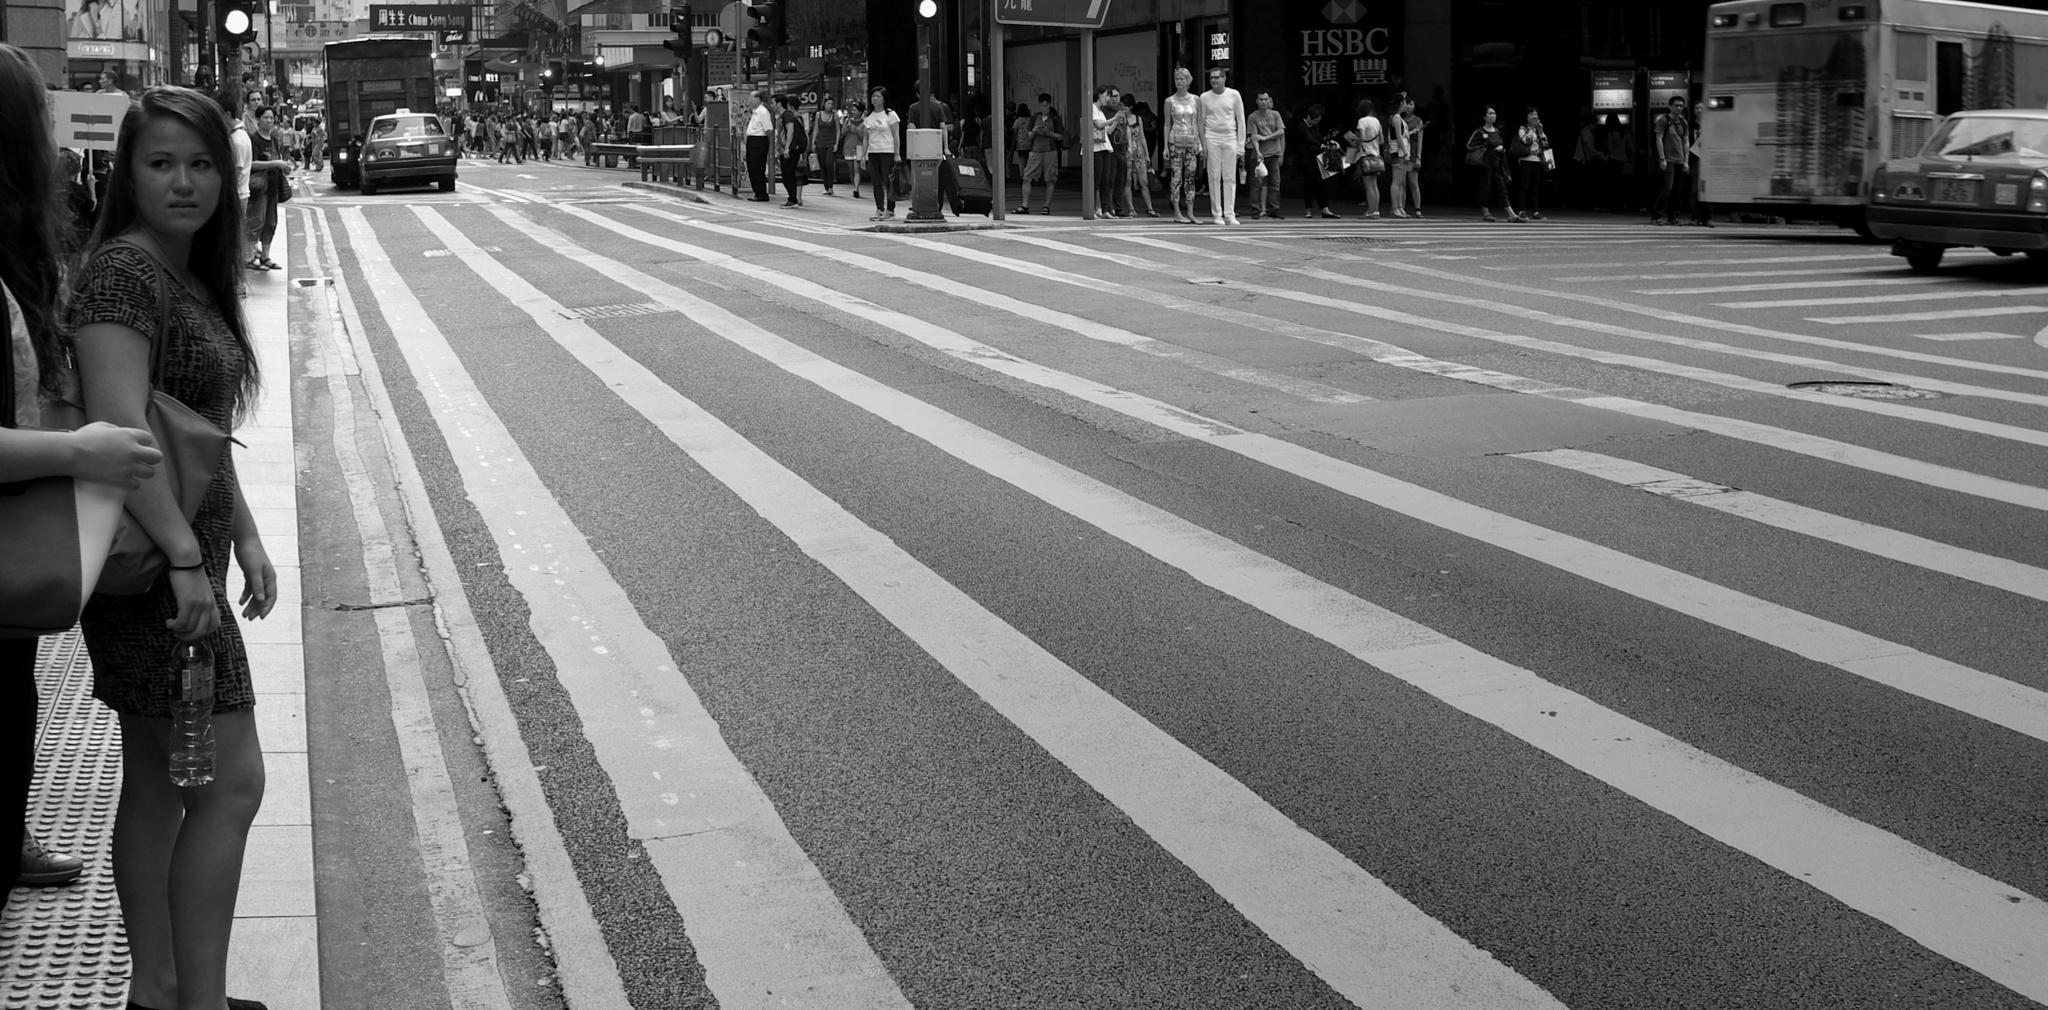 The Crossing by Rickie Lee